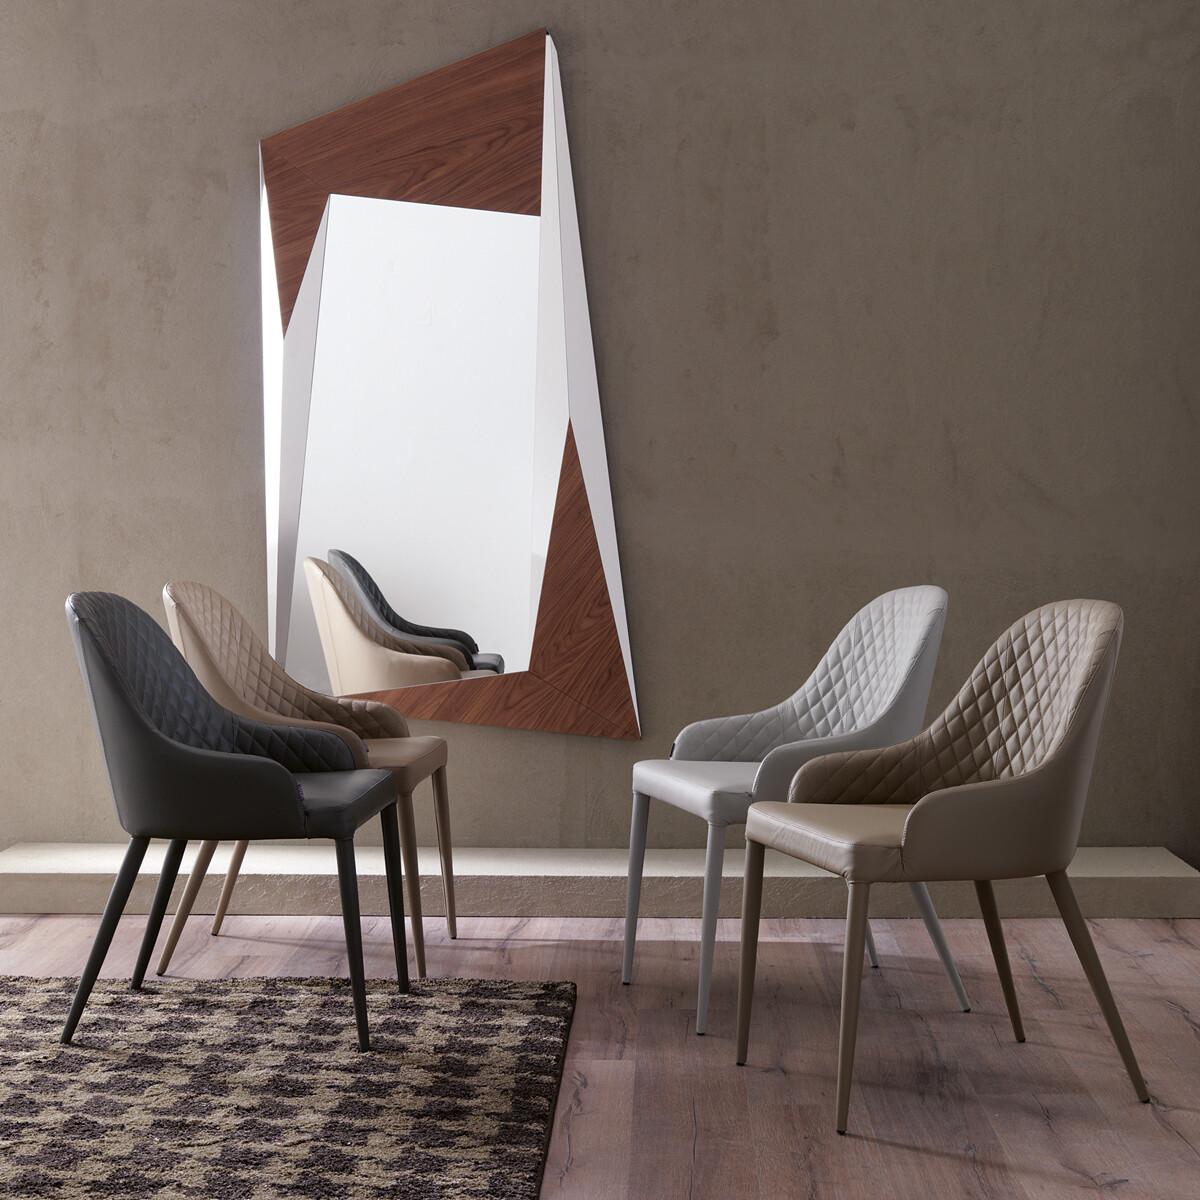 Ozzio betta designer stuhl s050 casa de for Stuhl designer